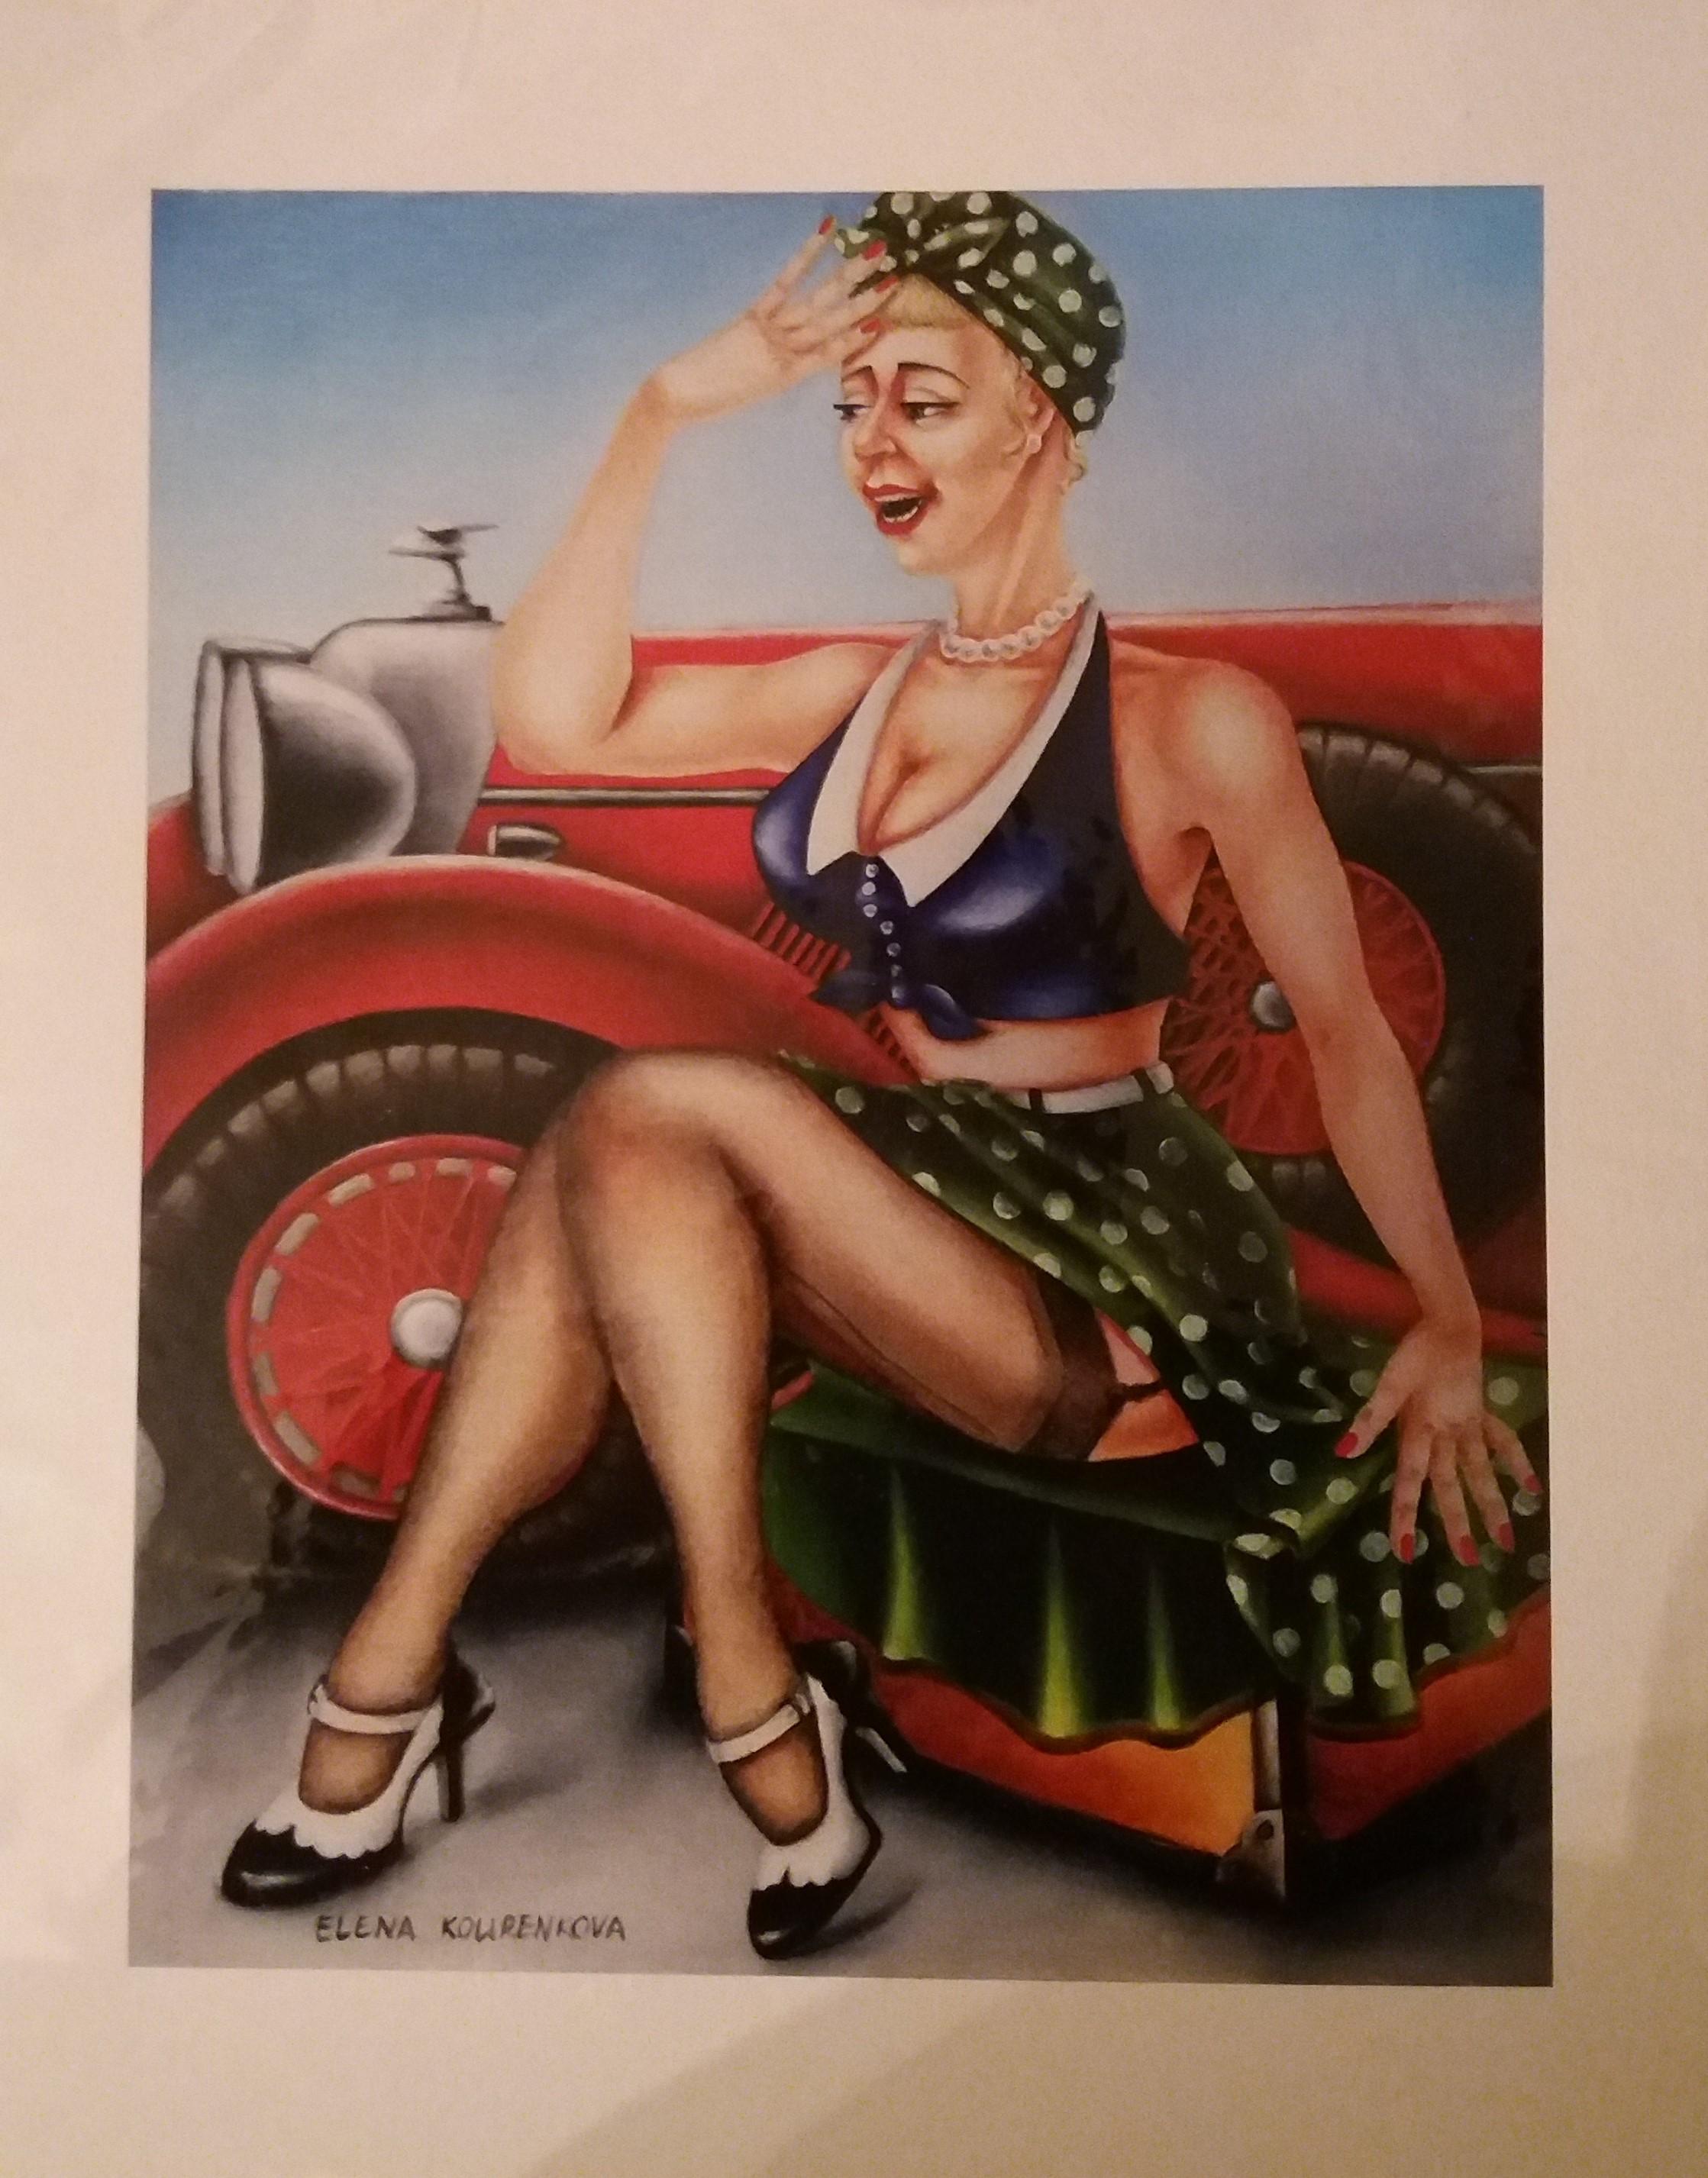 vintage pin-up car art painting